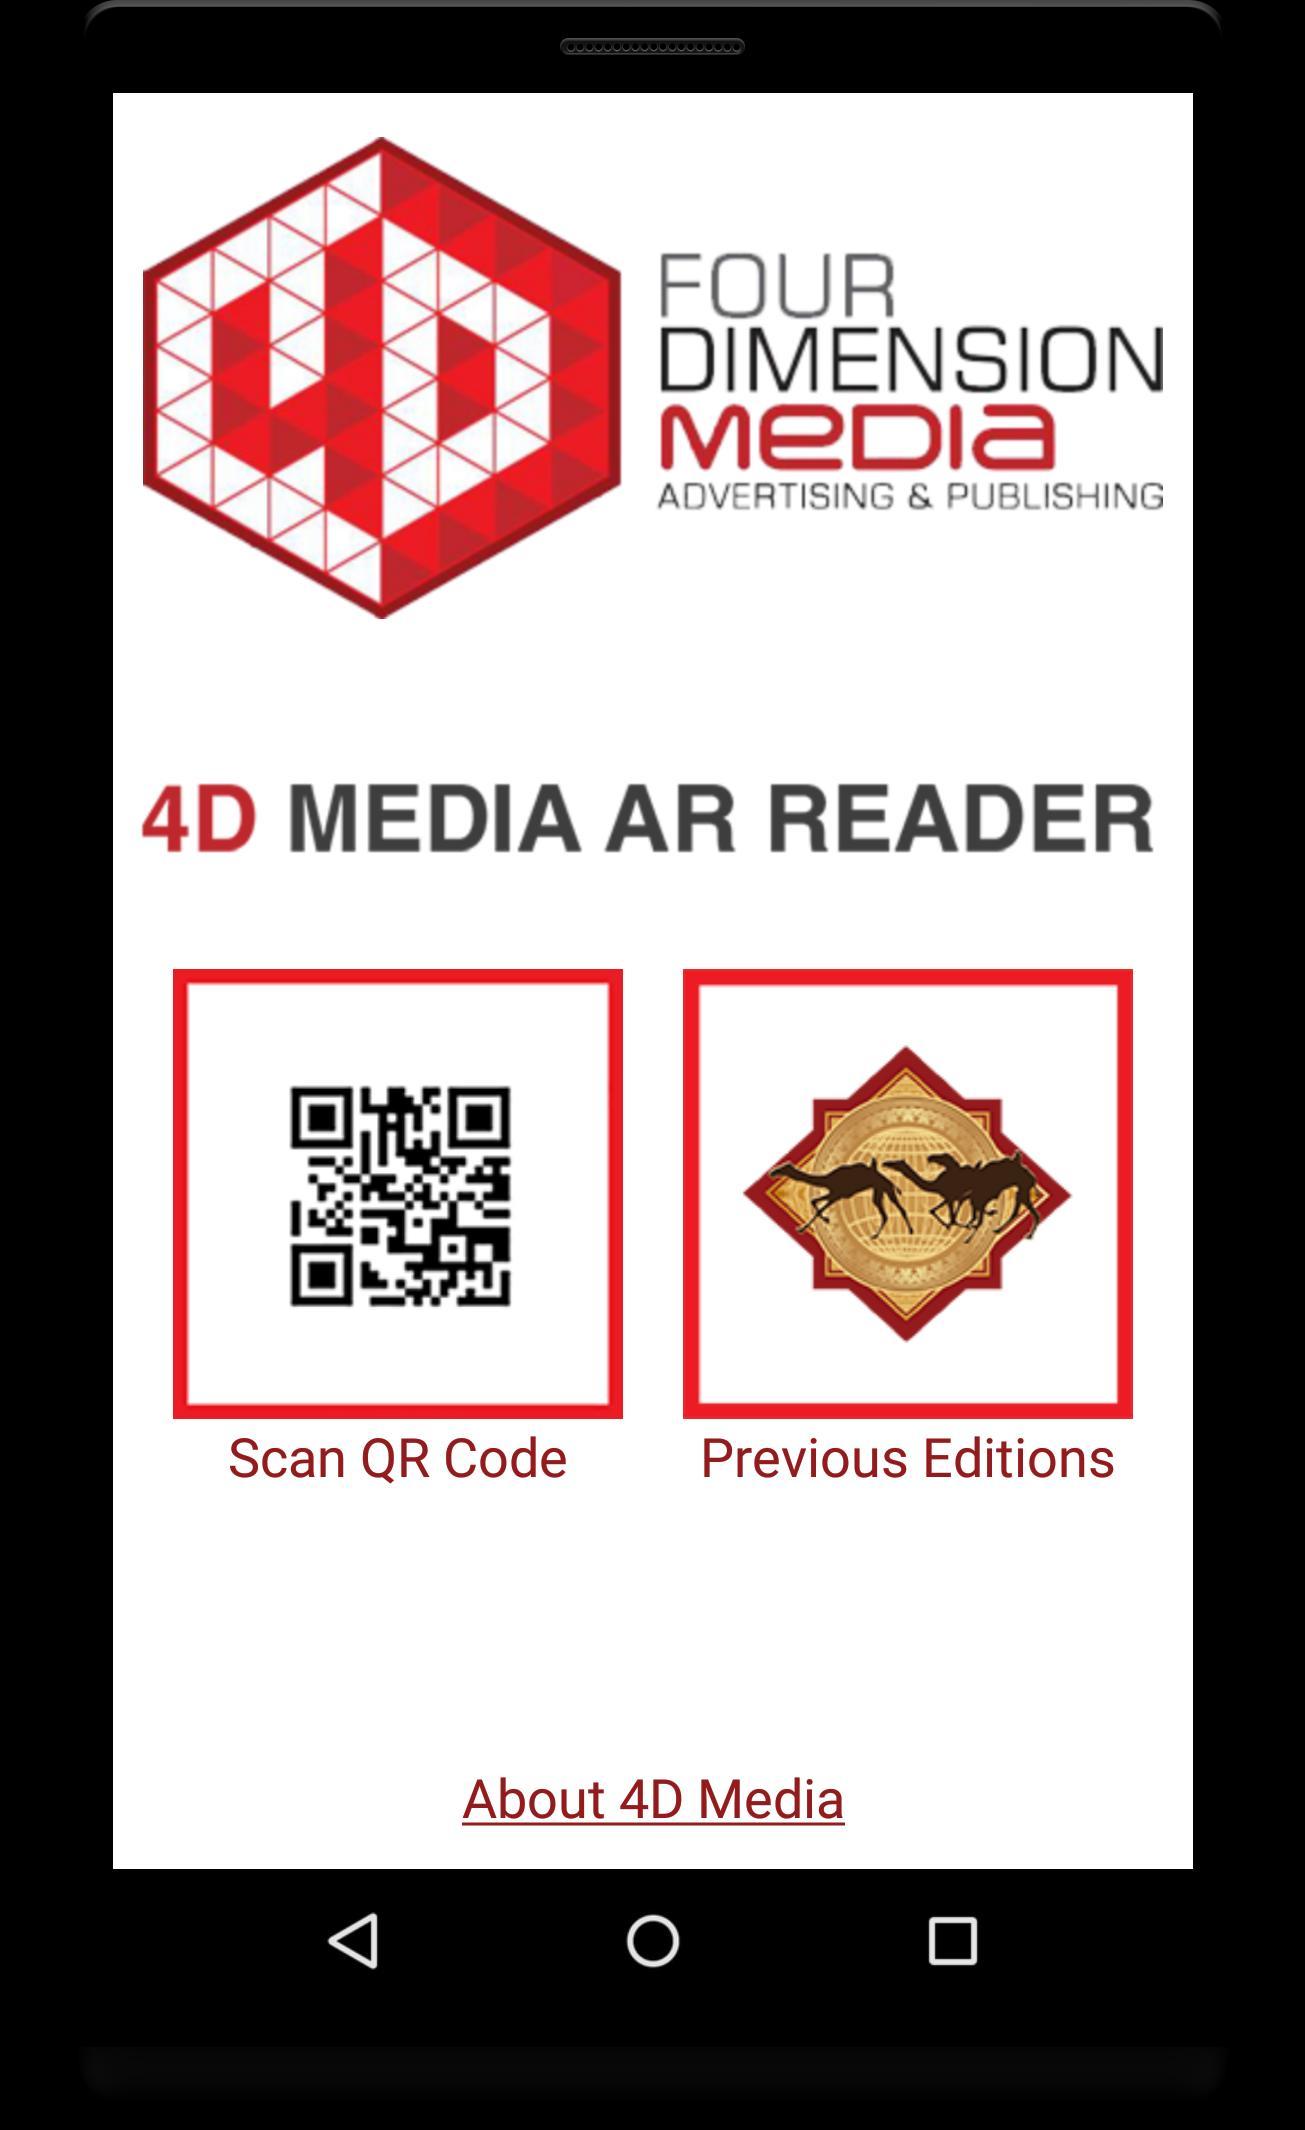 4D Media AR Reader for Android - APK Download